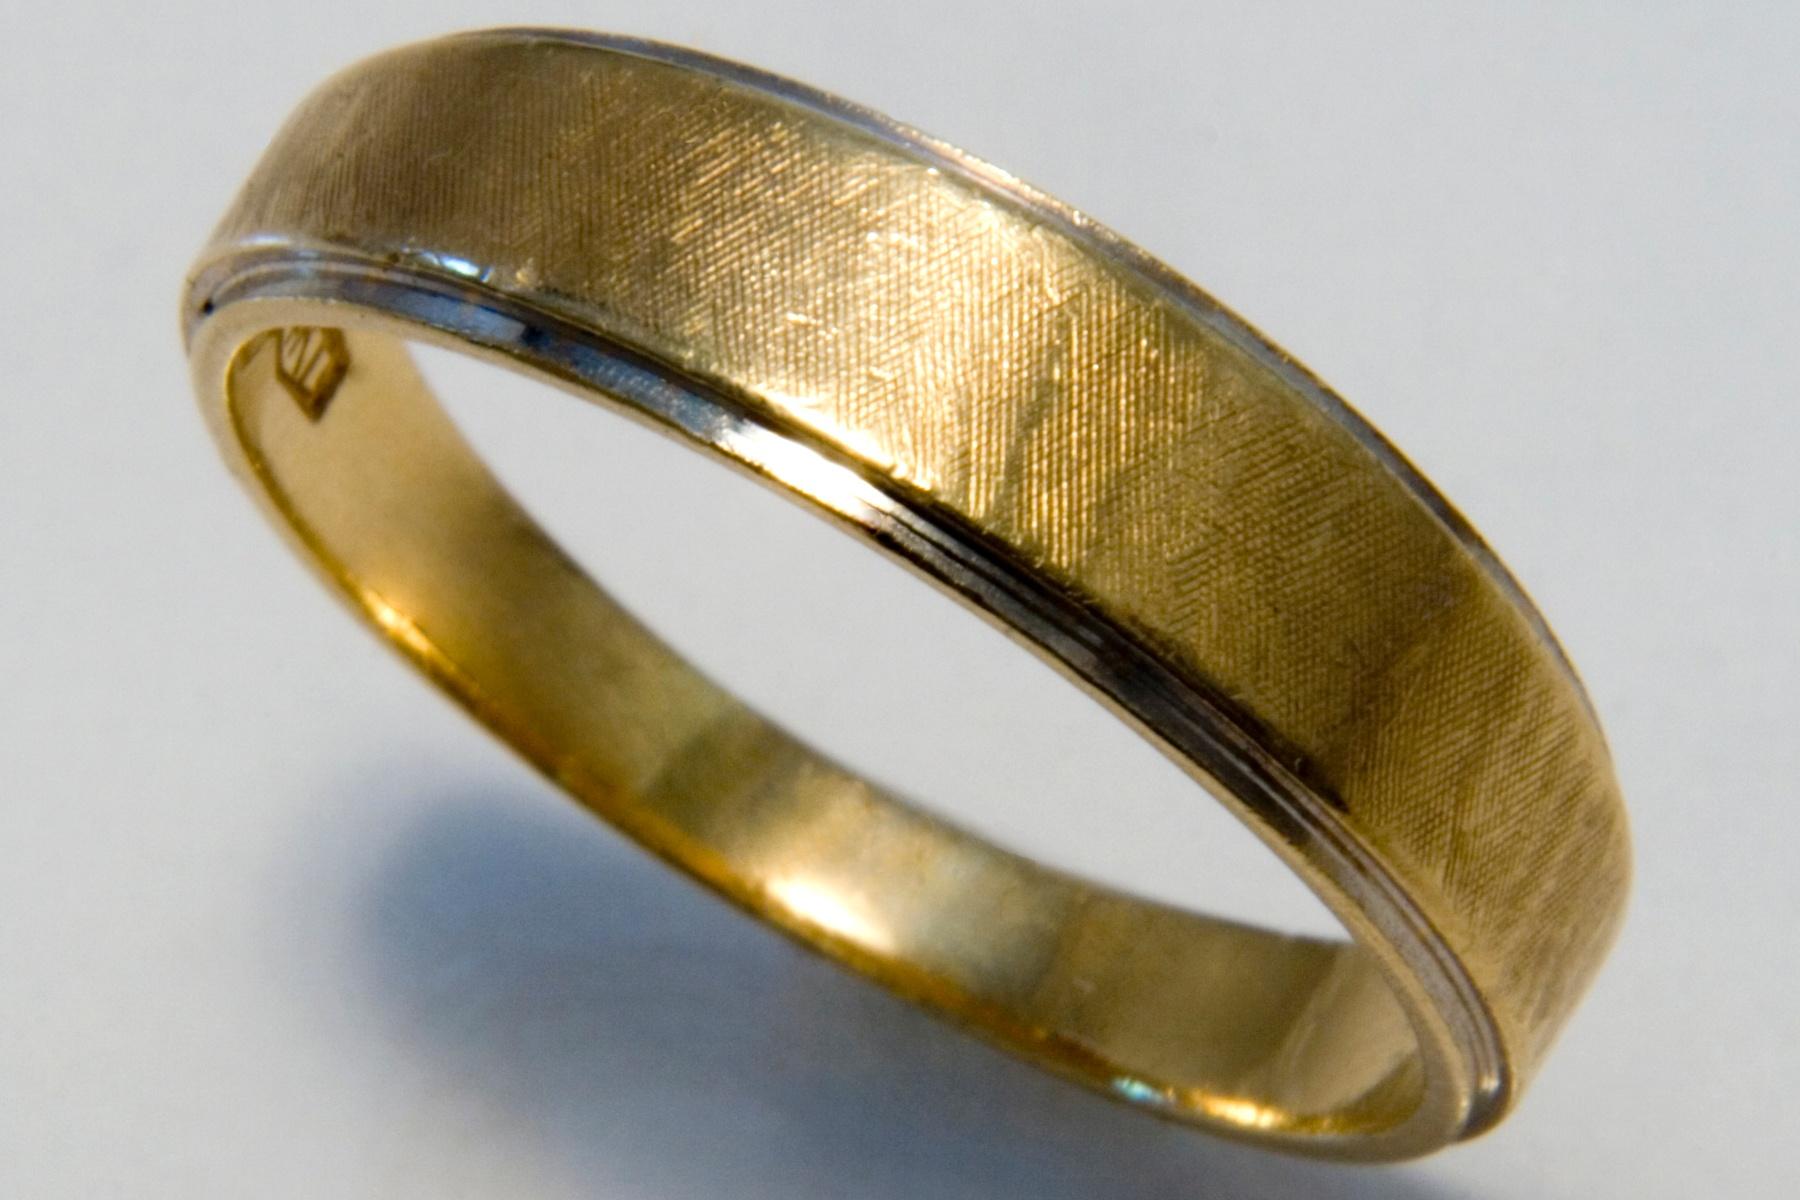 male wedding ring close up by Bernard Mordorski